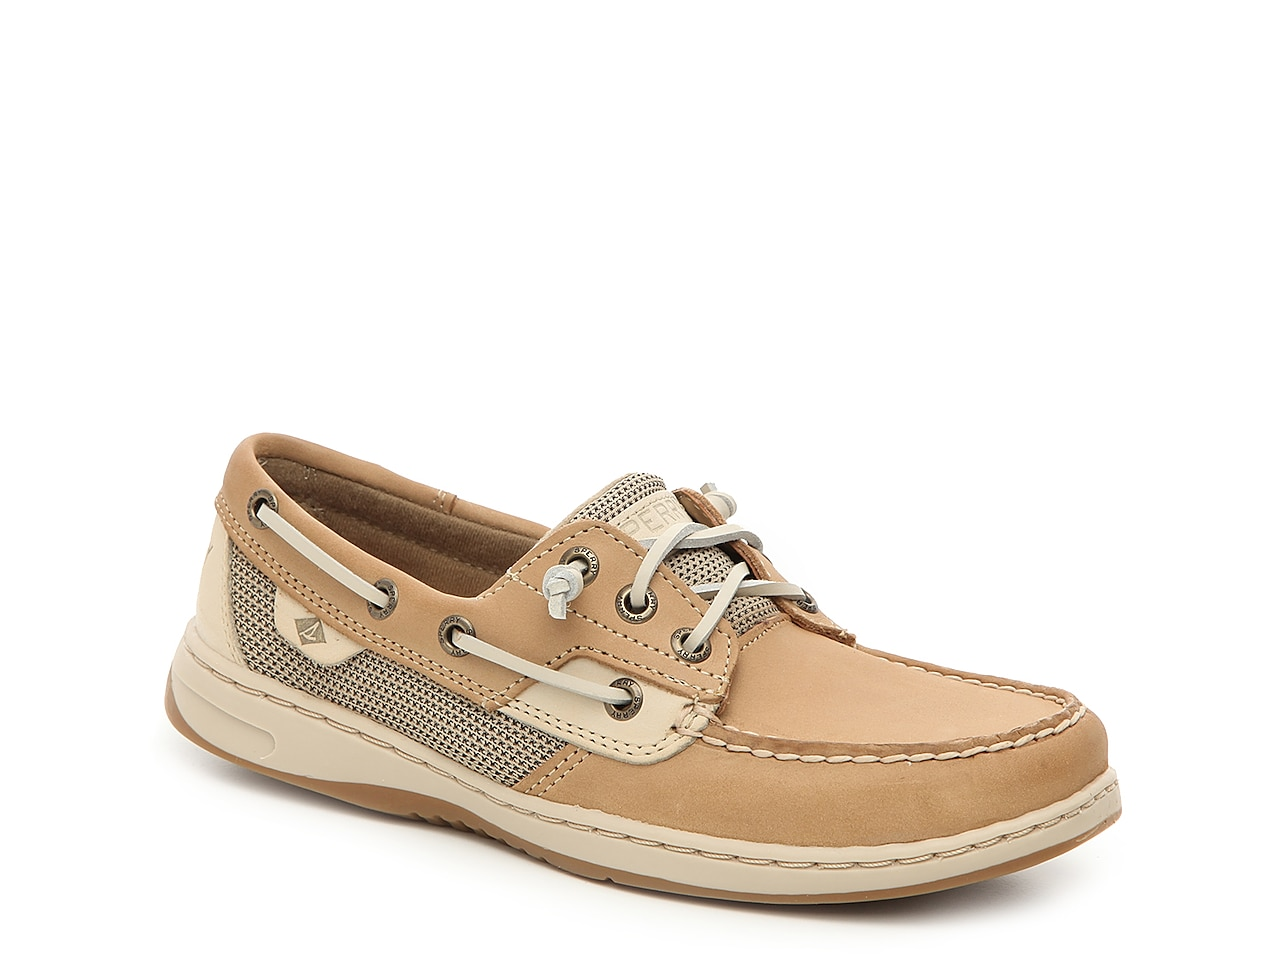 Sperry Womens Rosefish Boat Shoe